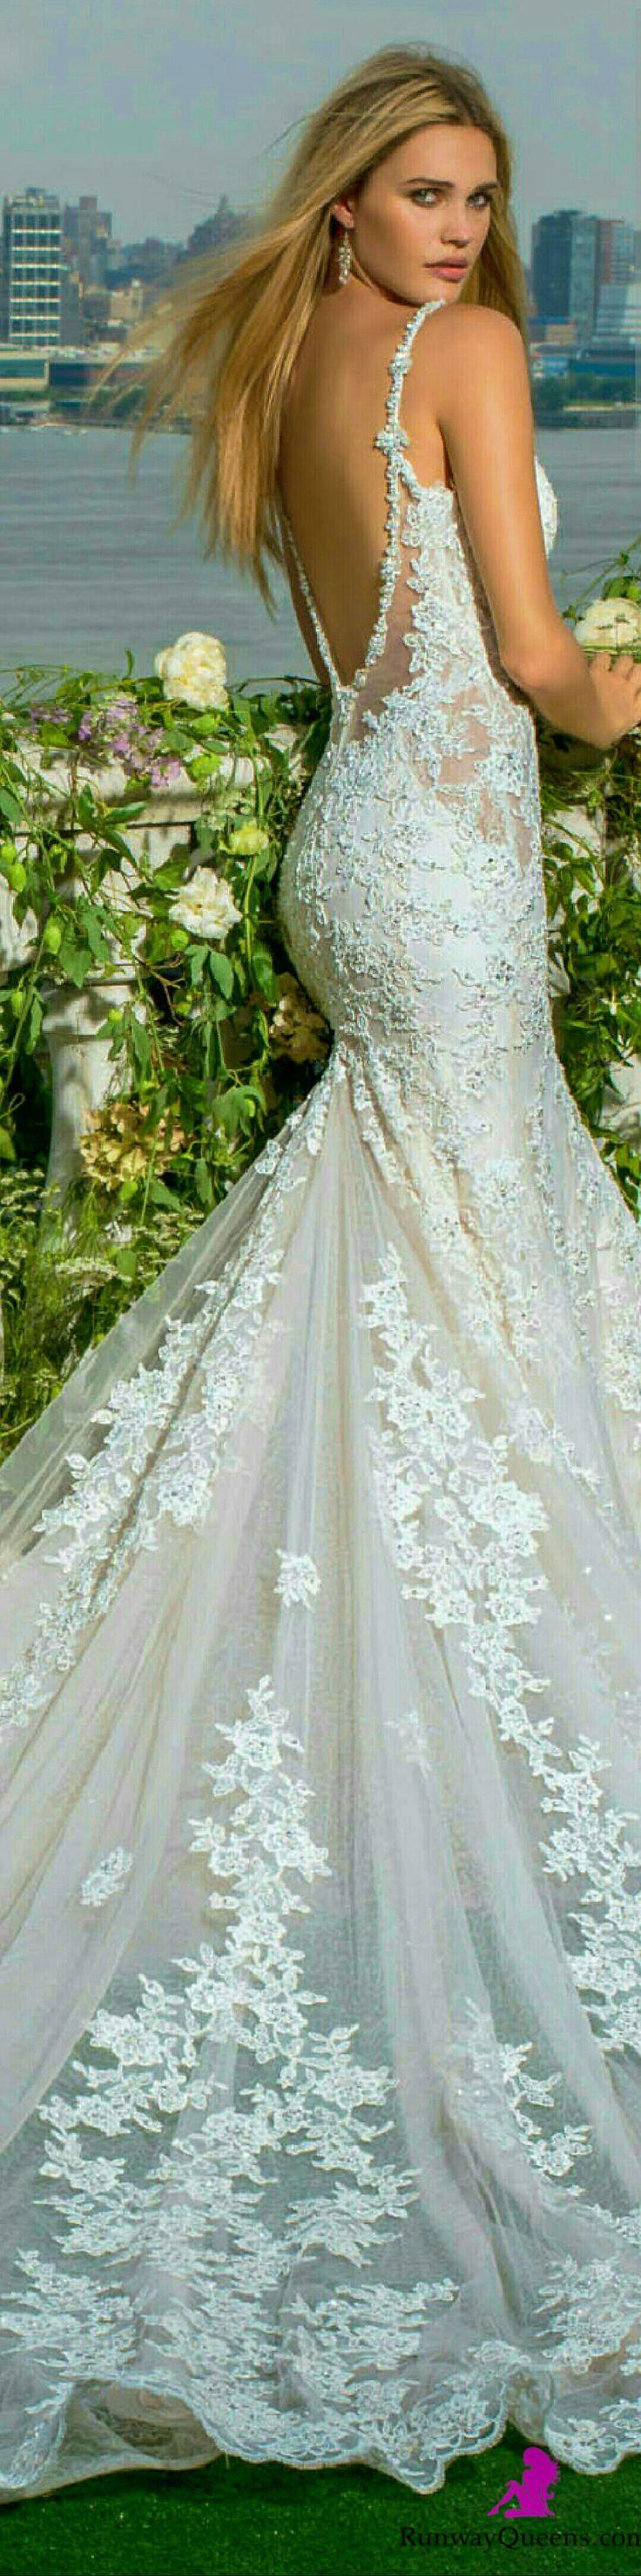 Eve of Milady, Bridal, 2017, white lace